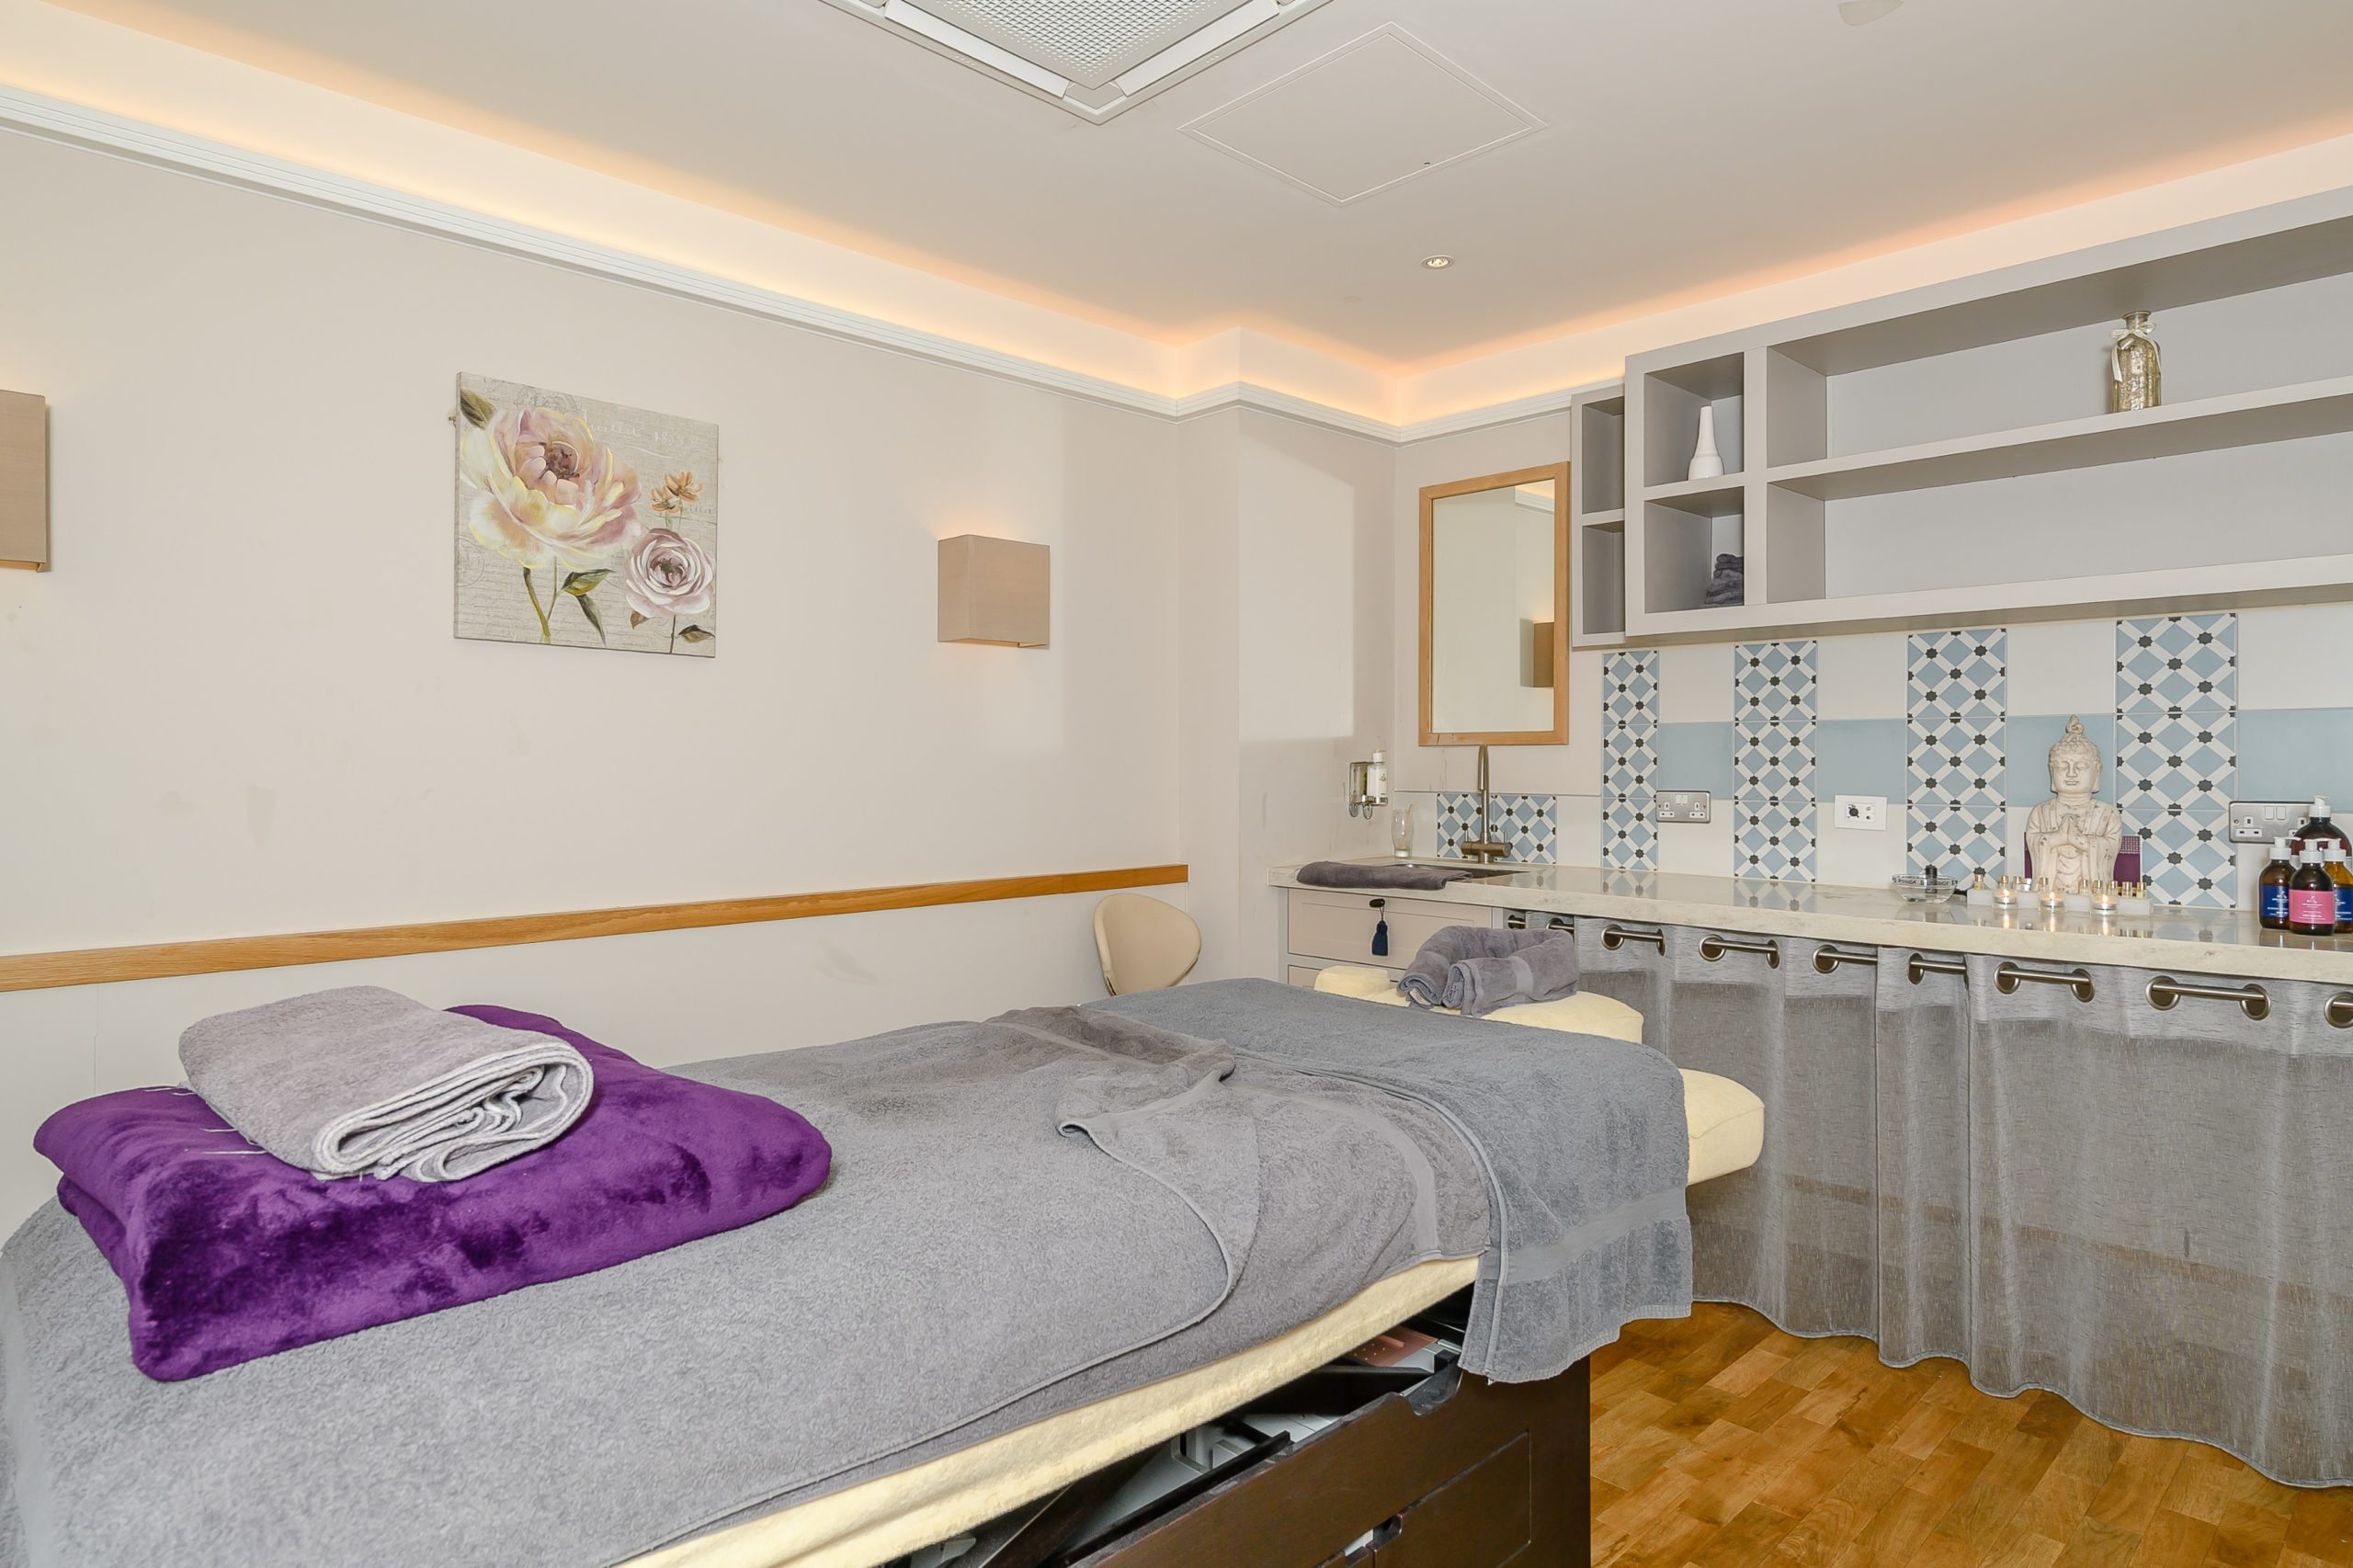 Massage table in Hawkchurch's spa